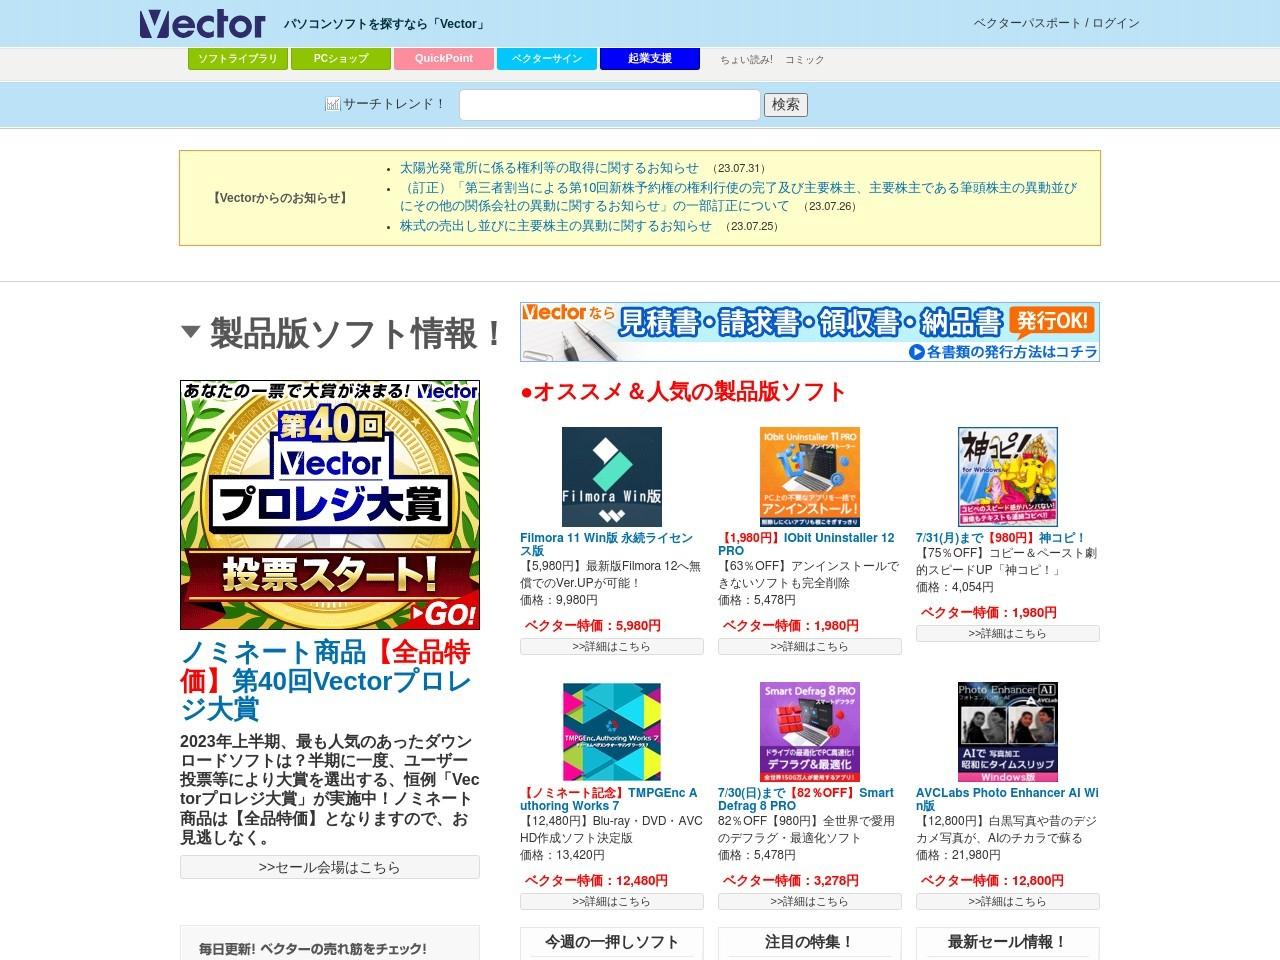 http://www.vector.co.jp/soft/dl/winnt/art/se430226.html